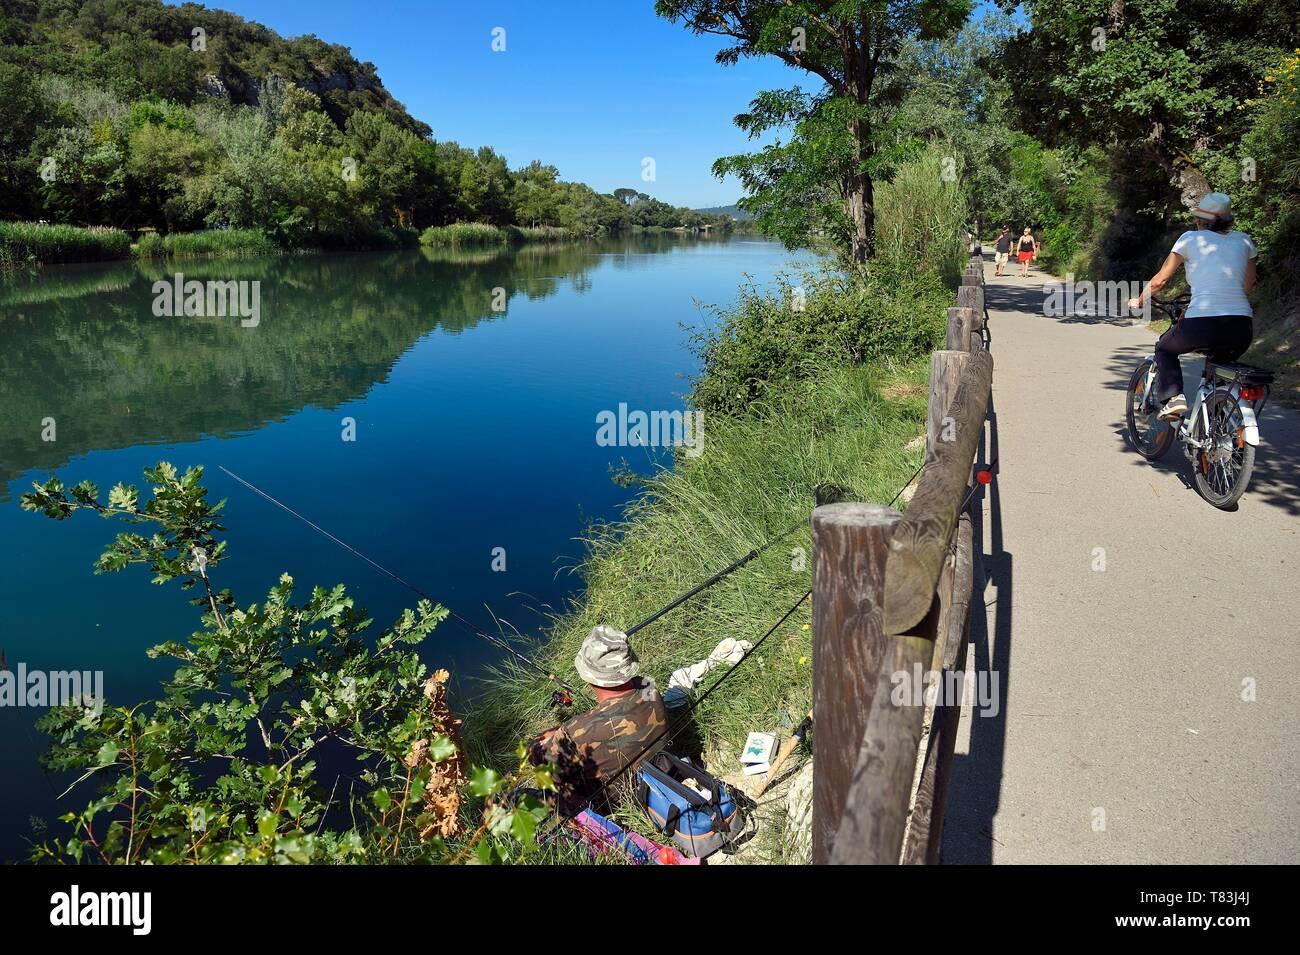 Francia, Alpes de Haute Provence, Parc Naturel Regional du Verdon (Parco naturale regionale del Verdon), Greoux les Bains, le rive del fiume Verdon percorso in bicicletta, pesca alla trota Foto Stock